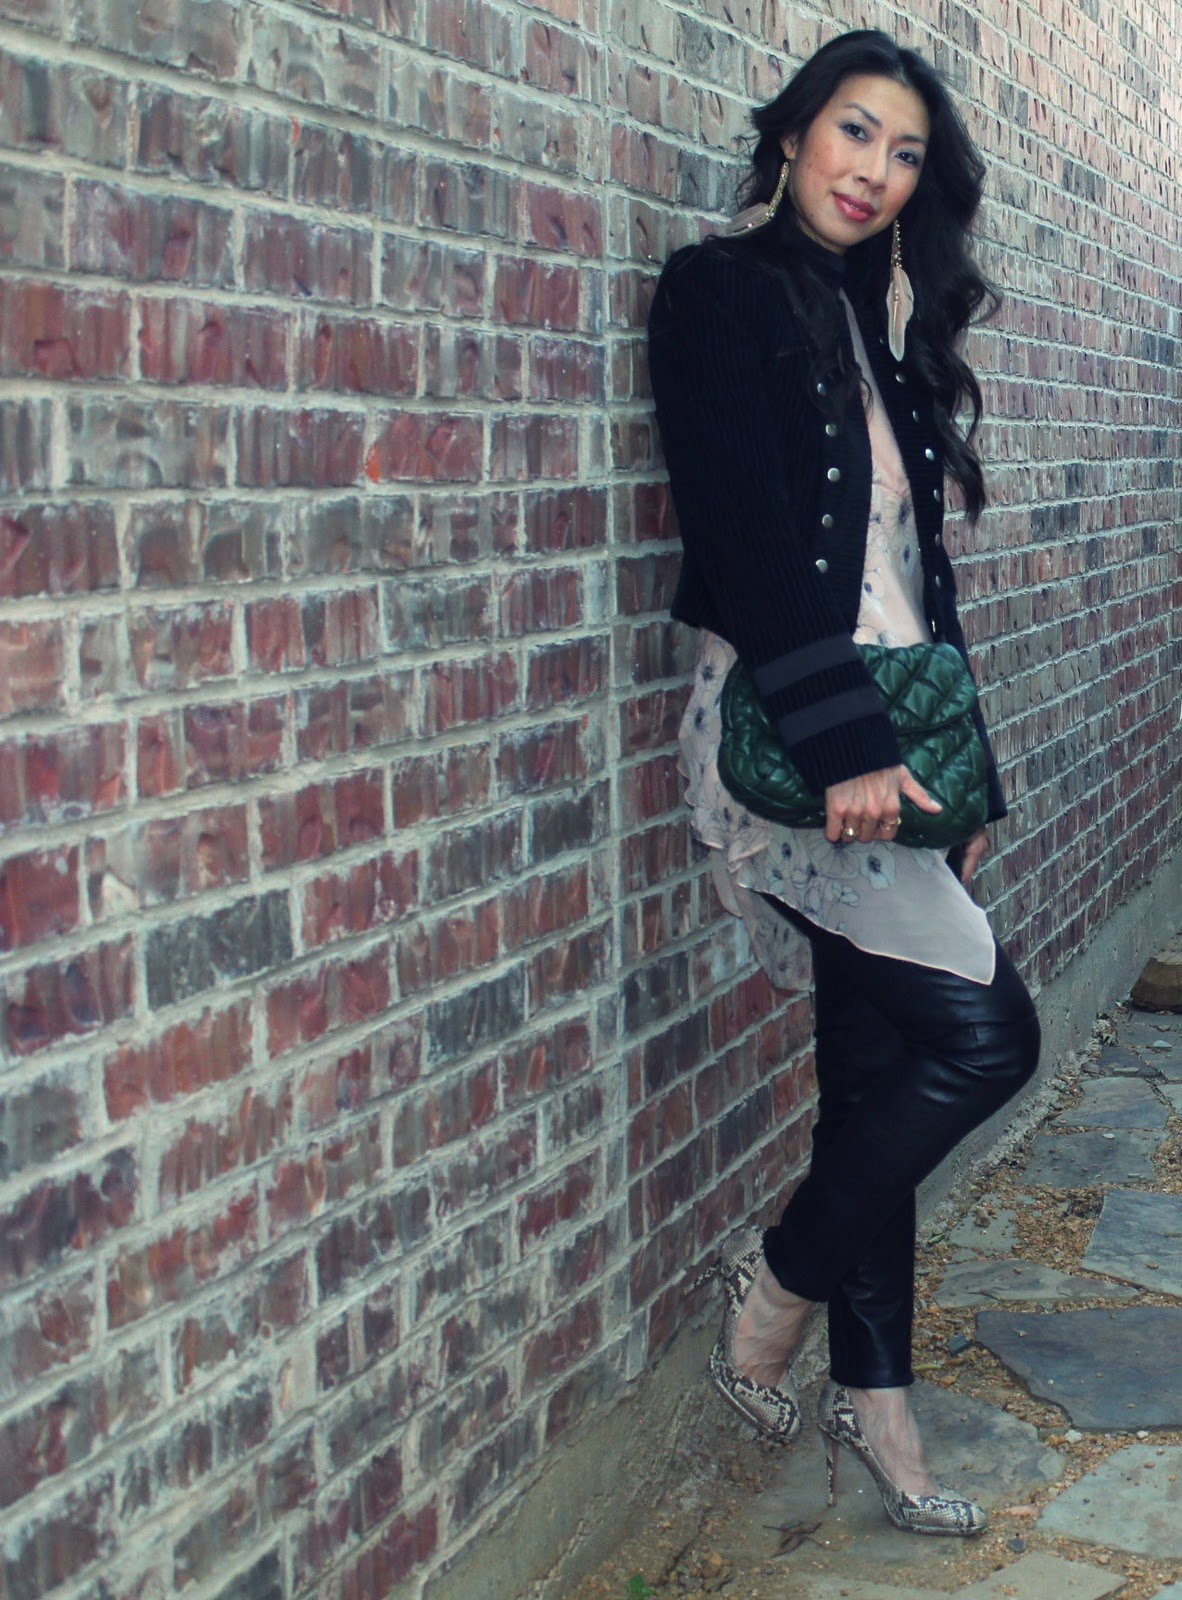 Rocker Chic - Style of Sam | DFW Fashion Blog